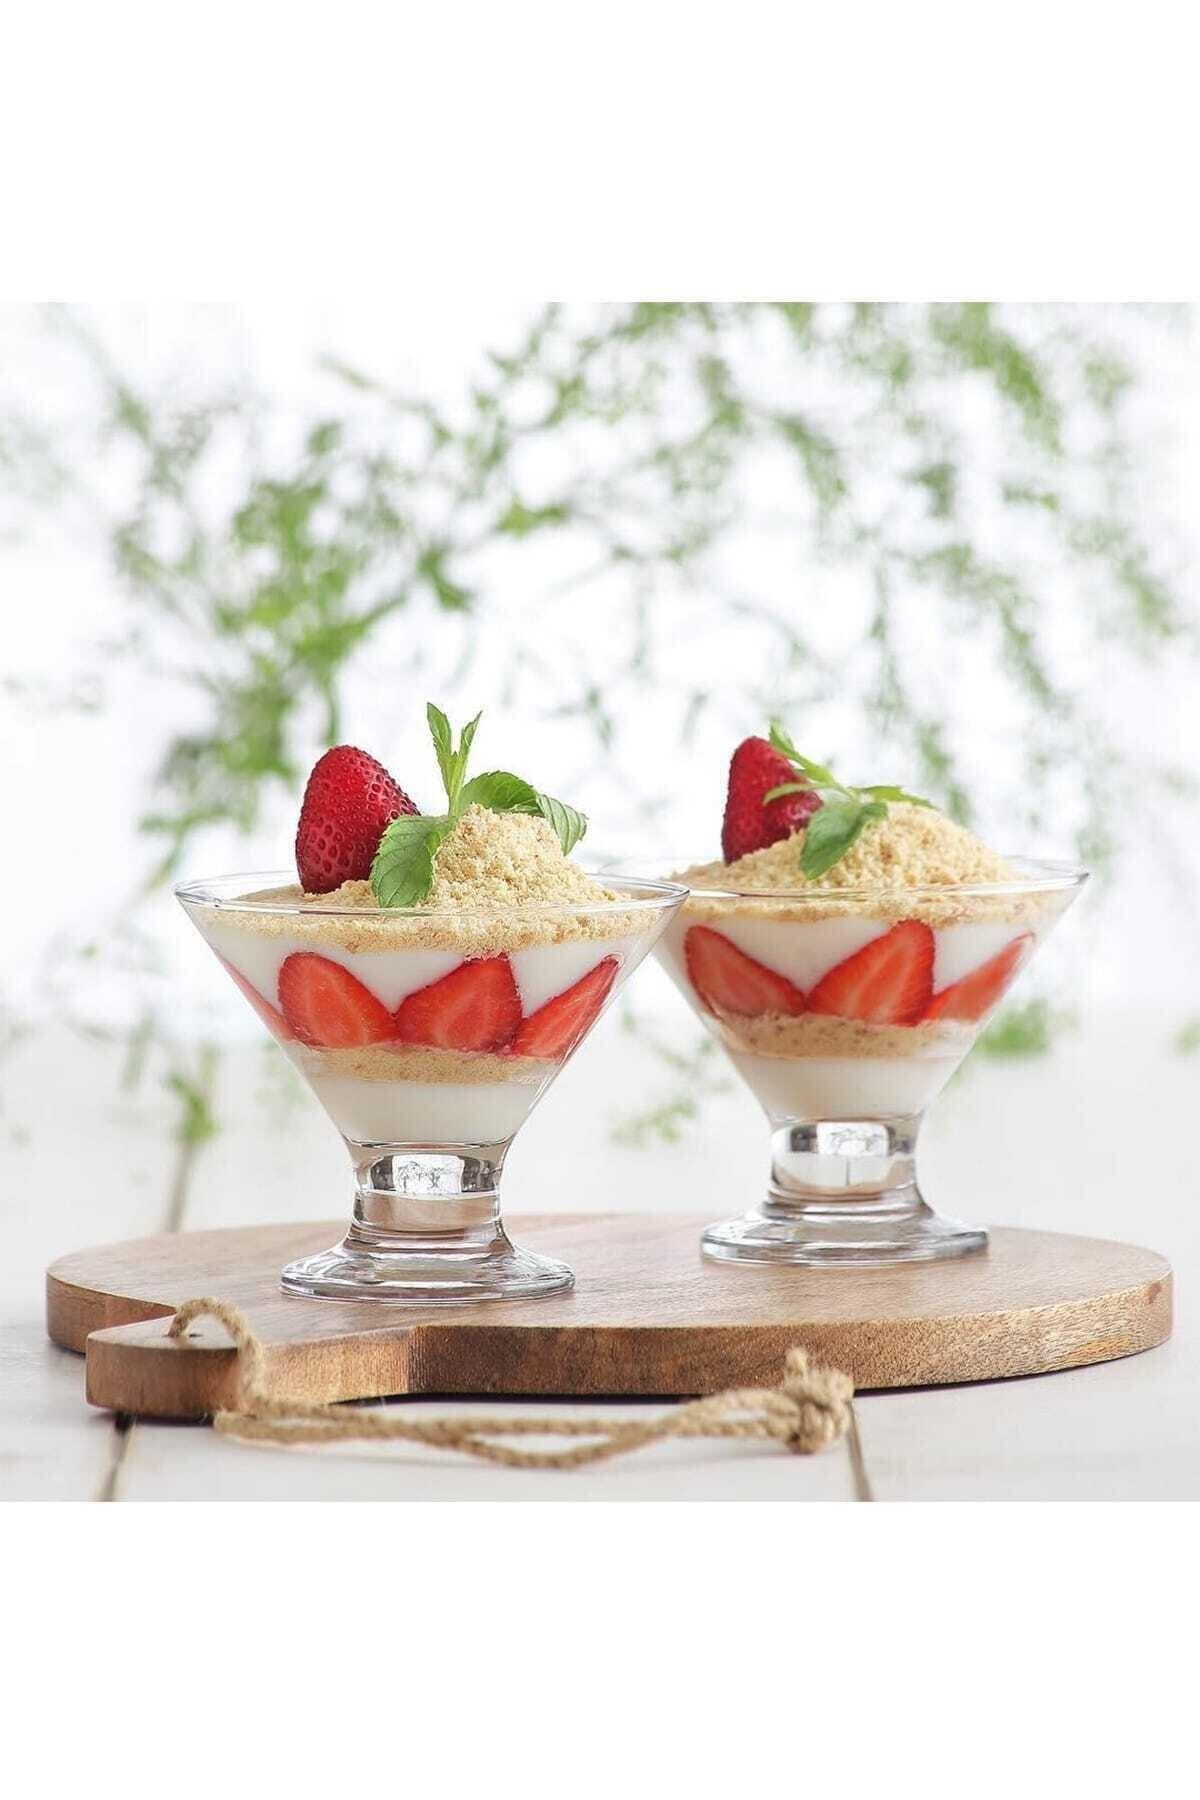 LAV Crema 6'lı Dondurmalık-tatlı Servisi 2